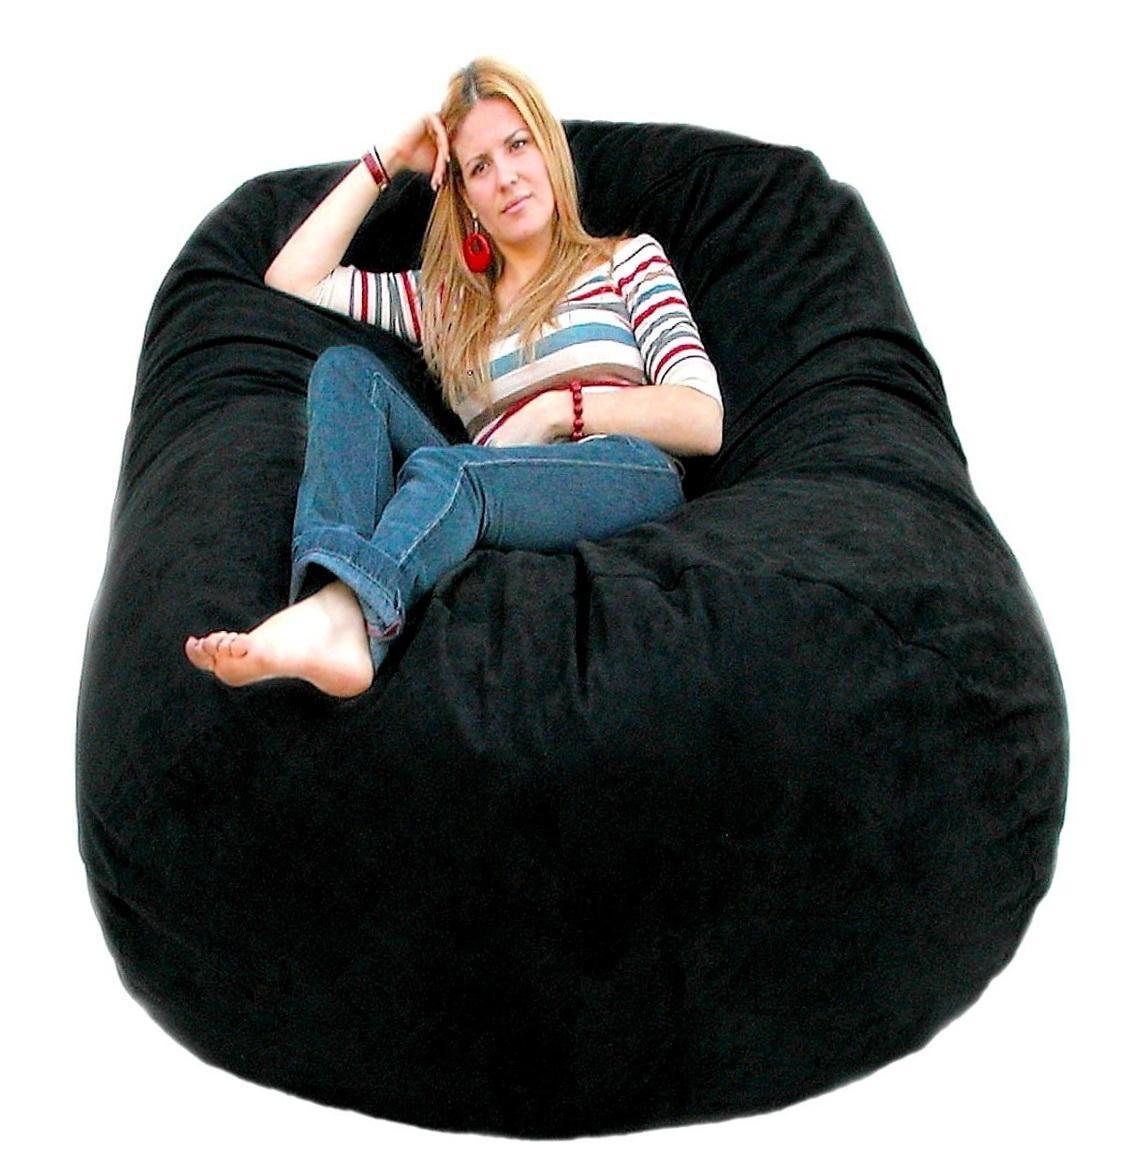 Big Bean Bag Chairs Cheapbig Bean Bag Chairs Cheap